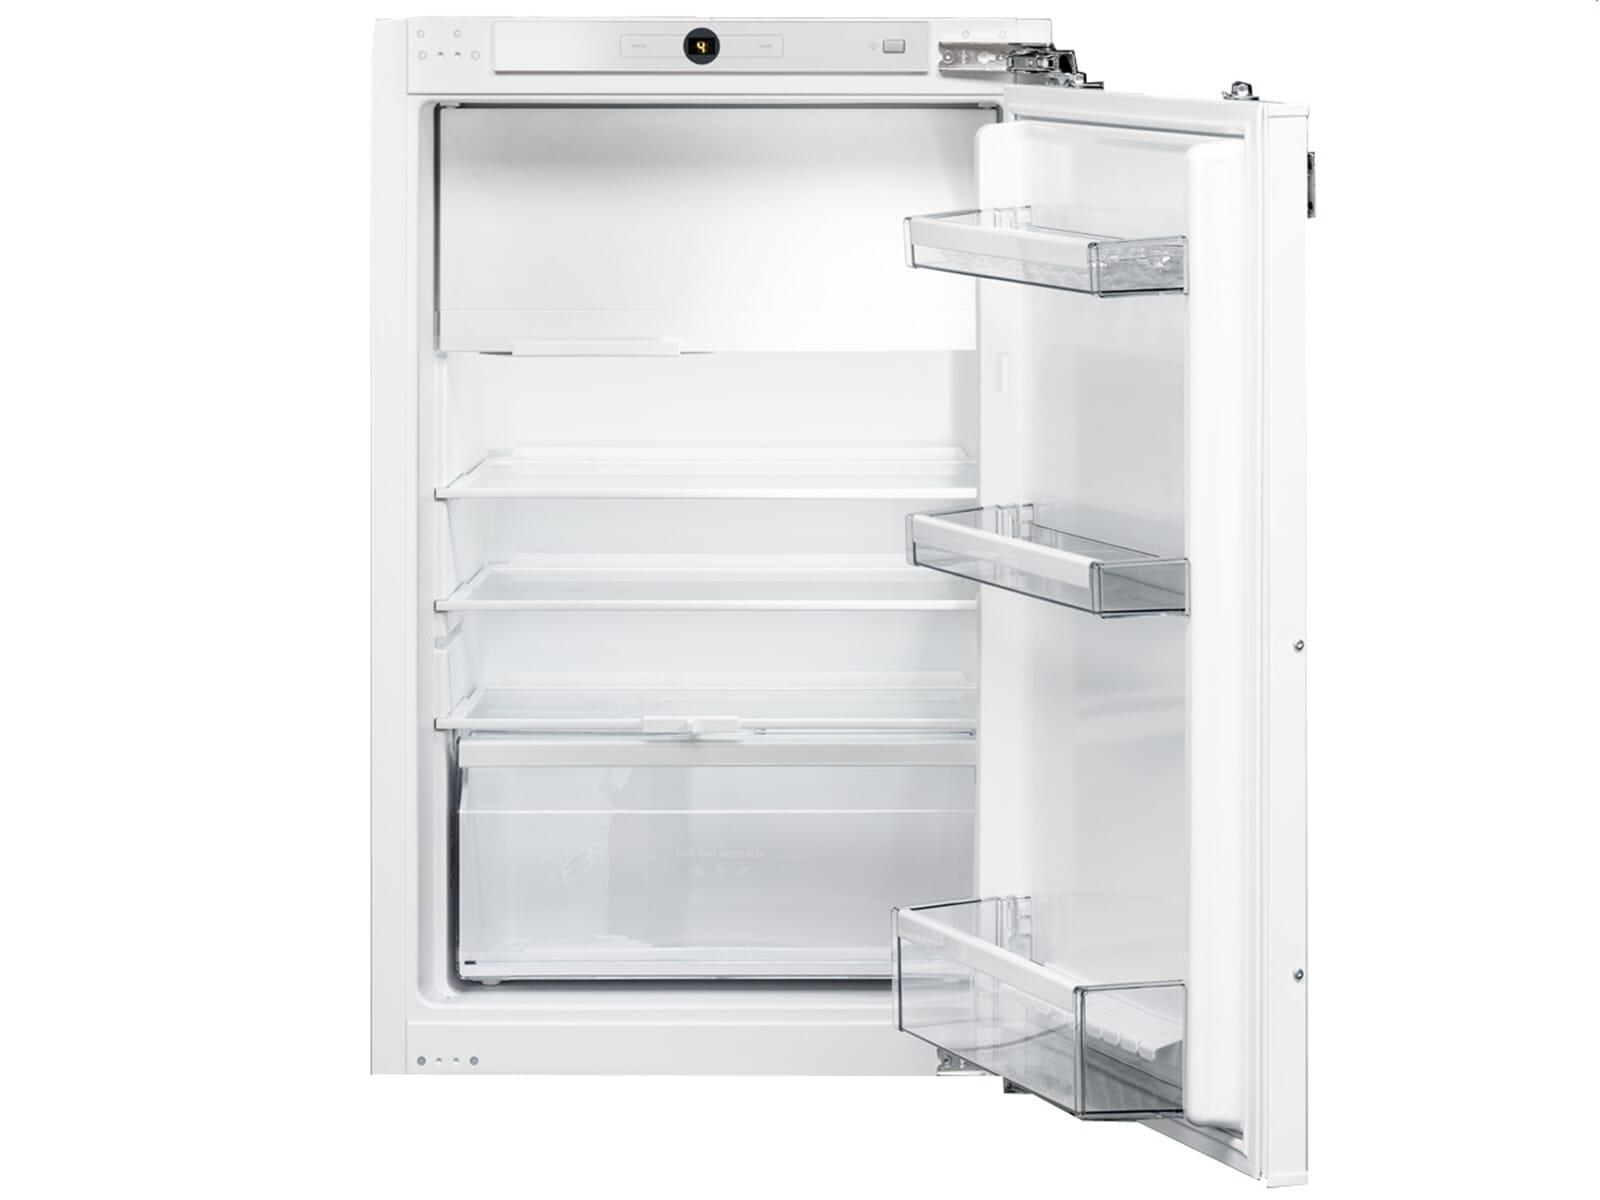 Smeg Kühlschrank Tür Geht Schwer Auf : Smeg sid140c einbaukühlschrank